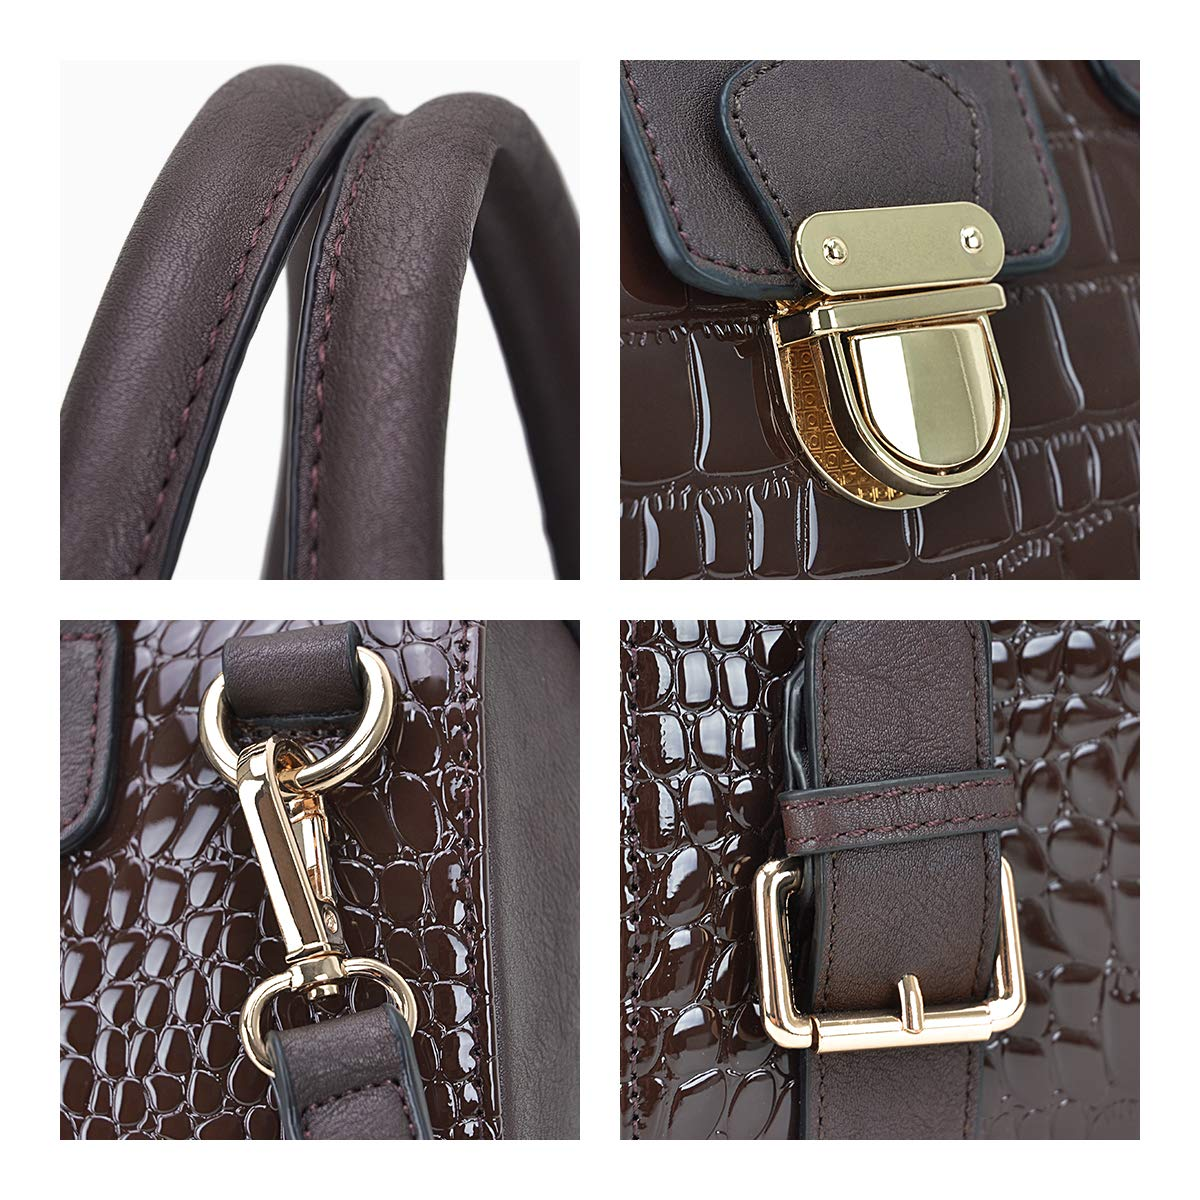 Dasein Women Barrel Handbags Purses Fashion Satchel Bags Top Handle Shoulder Bags Vegan Leather Tote Bags by Dasein (Image #4)